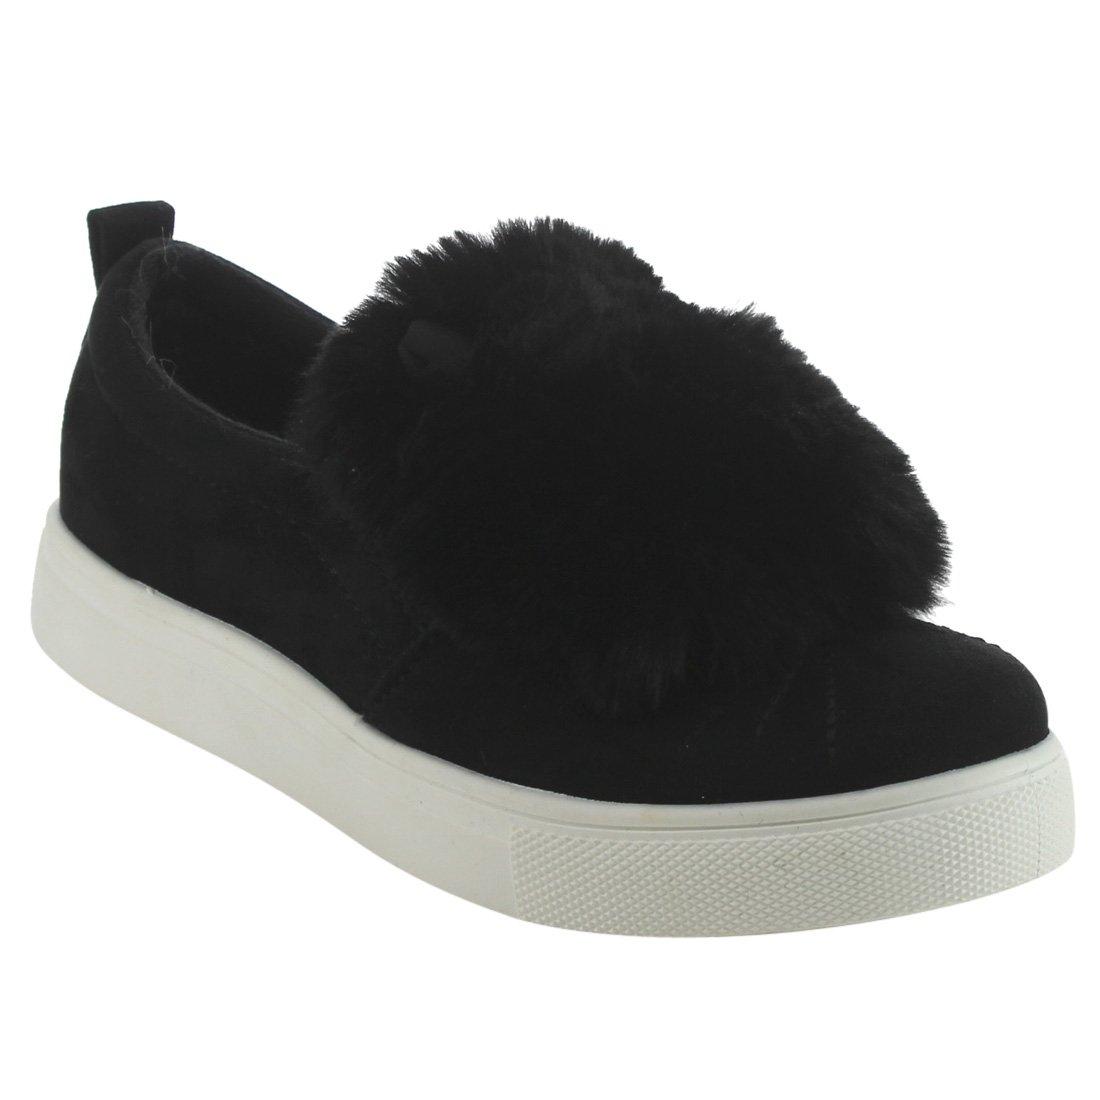 Betani EI61 Girls Low Top Elastic Gore Side Pom Poms Slip On Fashion Sneakers